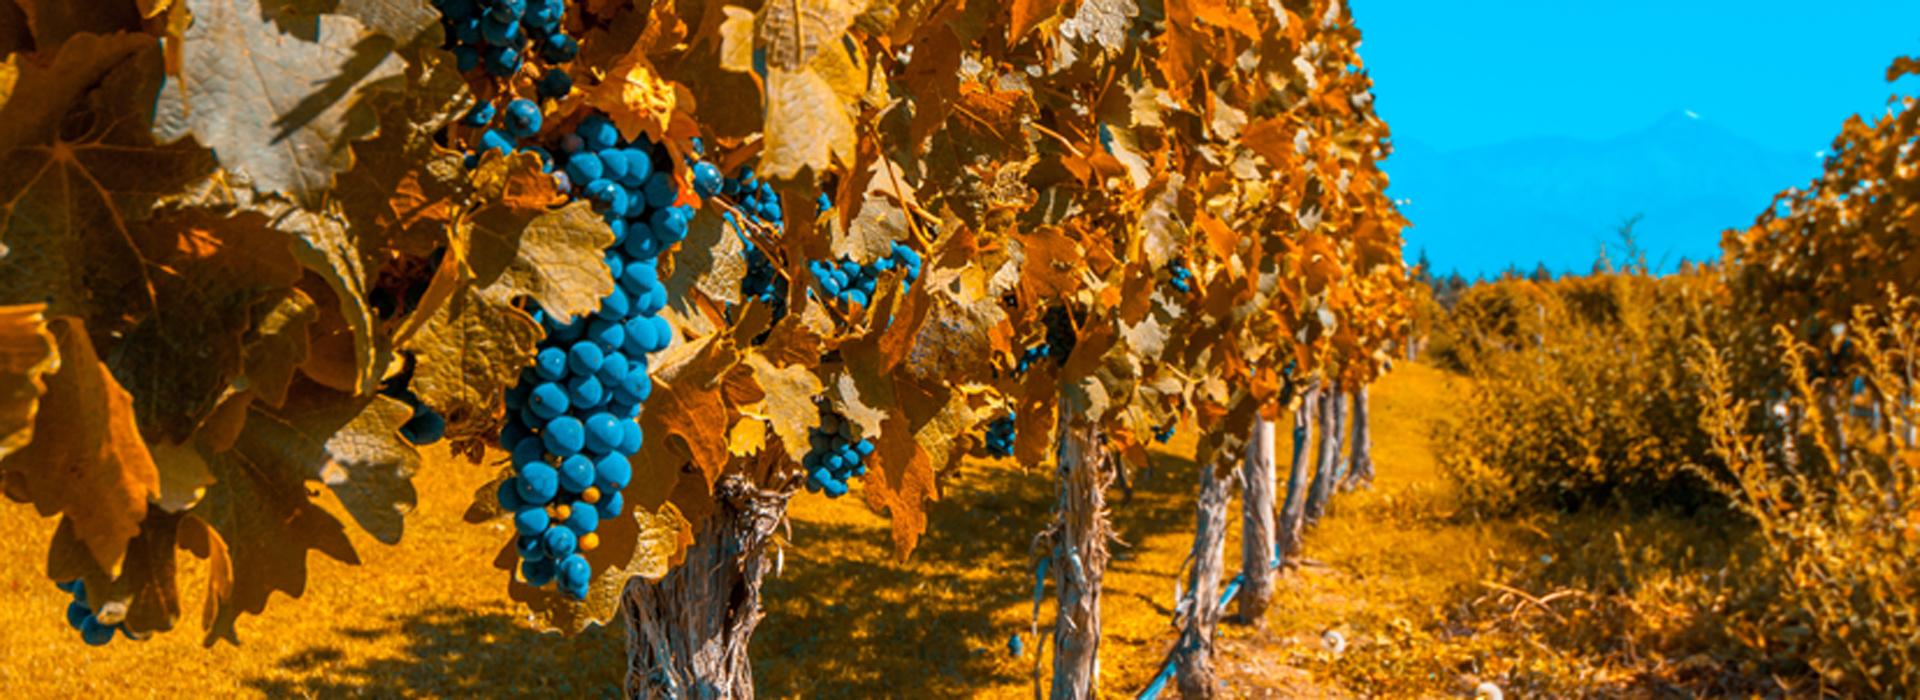 Vineyards-of-Mendoza,-Argentina